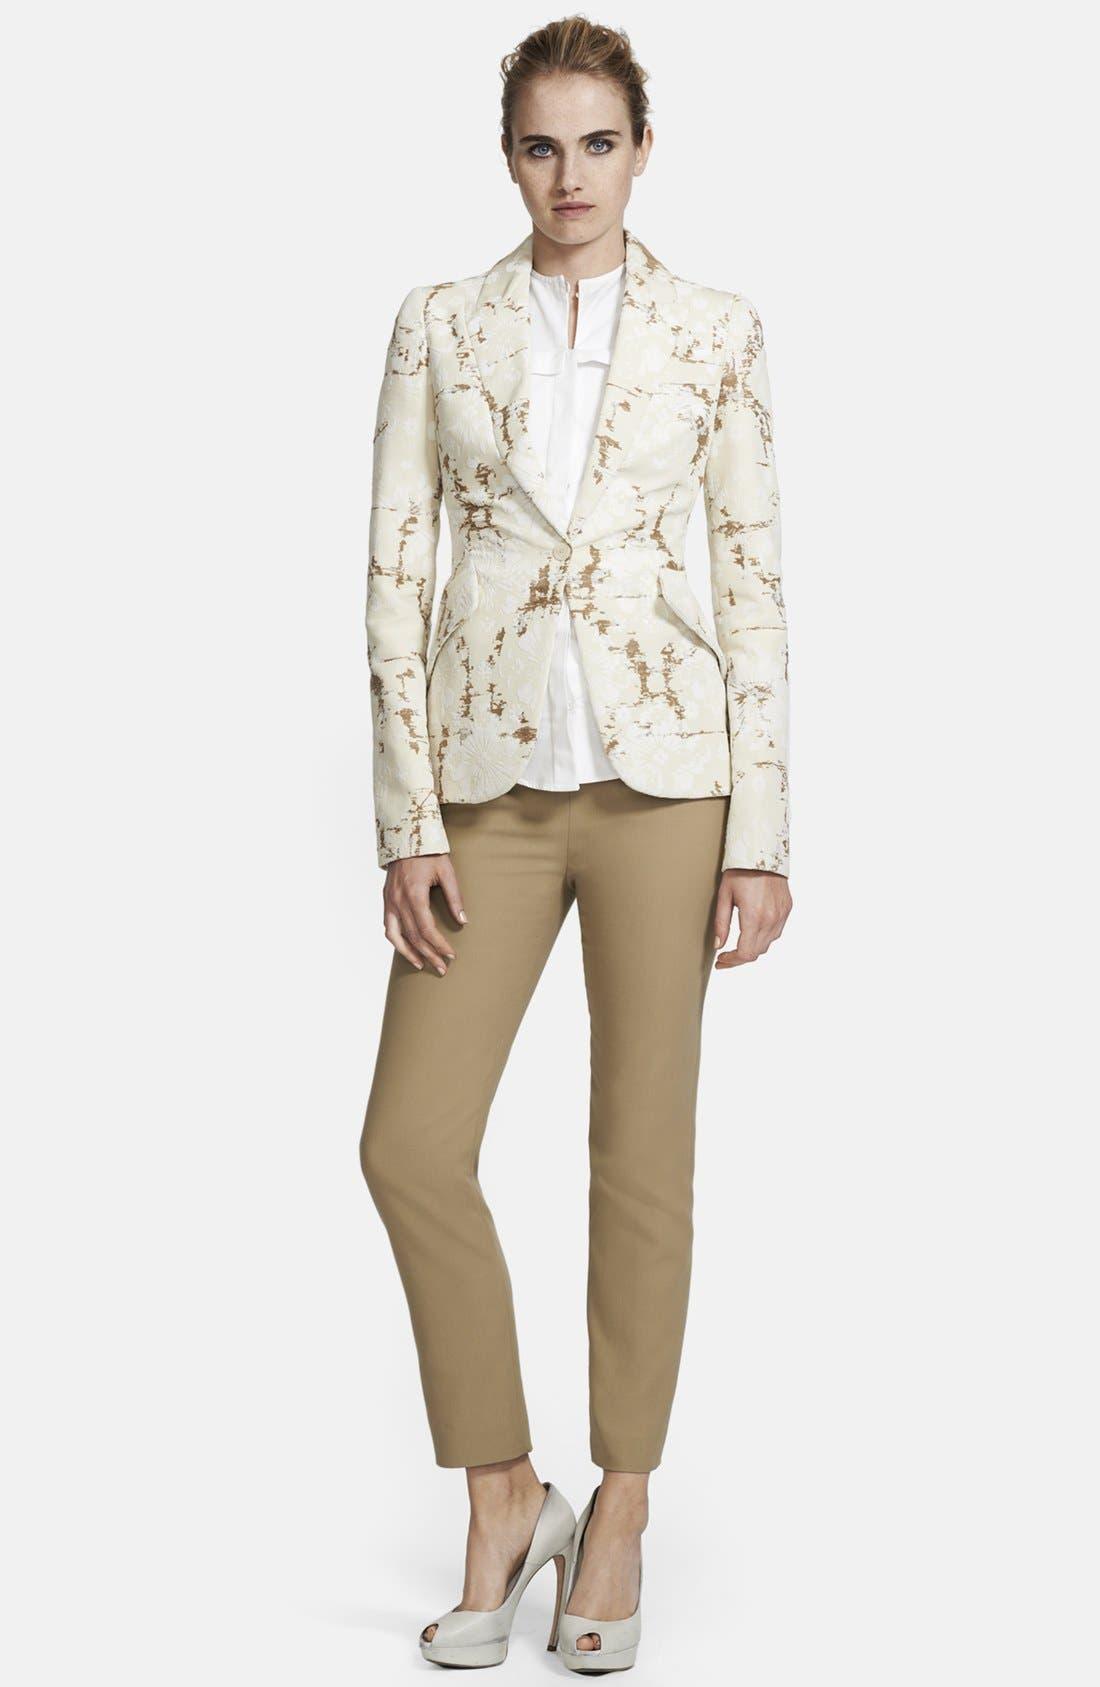 Alternate Image 1 Selected - Alexander McQueen Flocked Cotton Jacquard Blazer